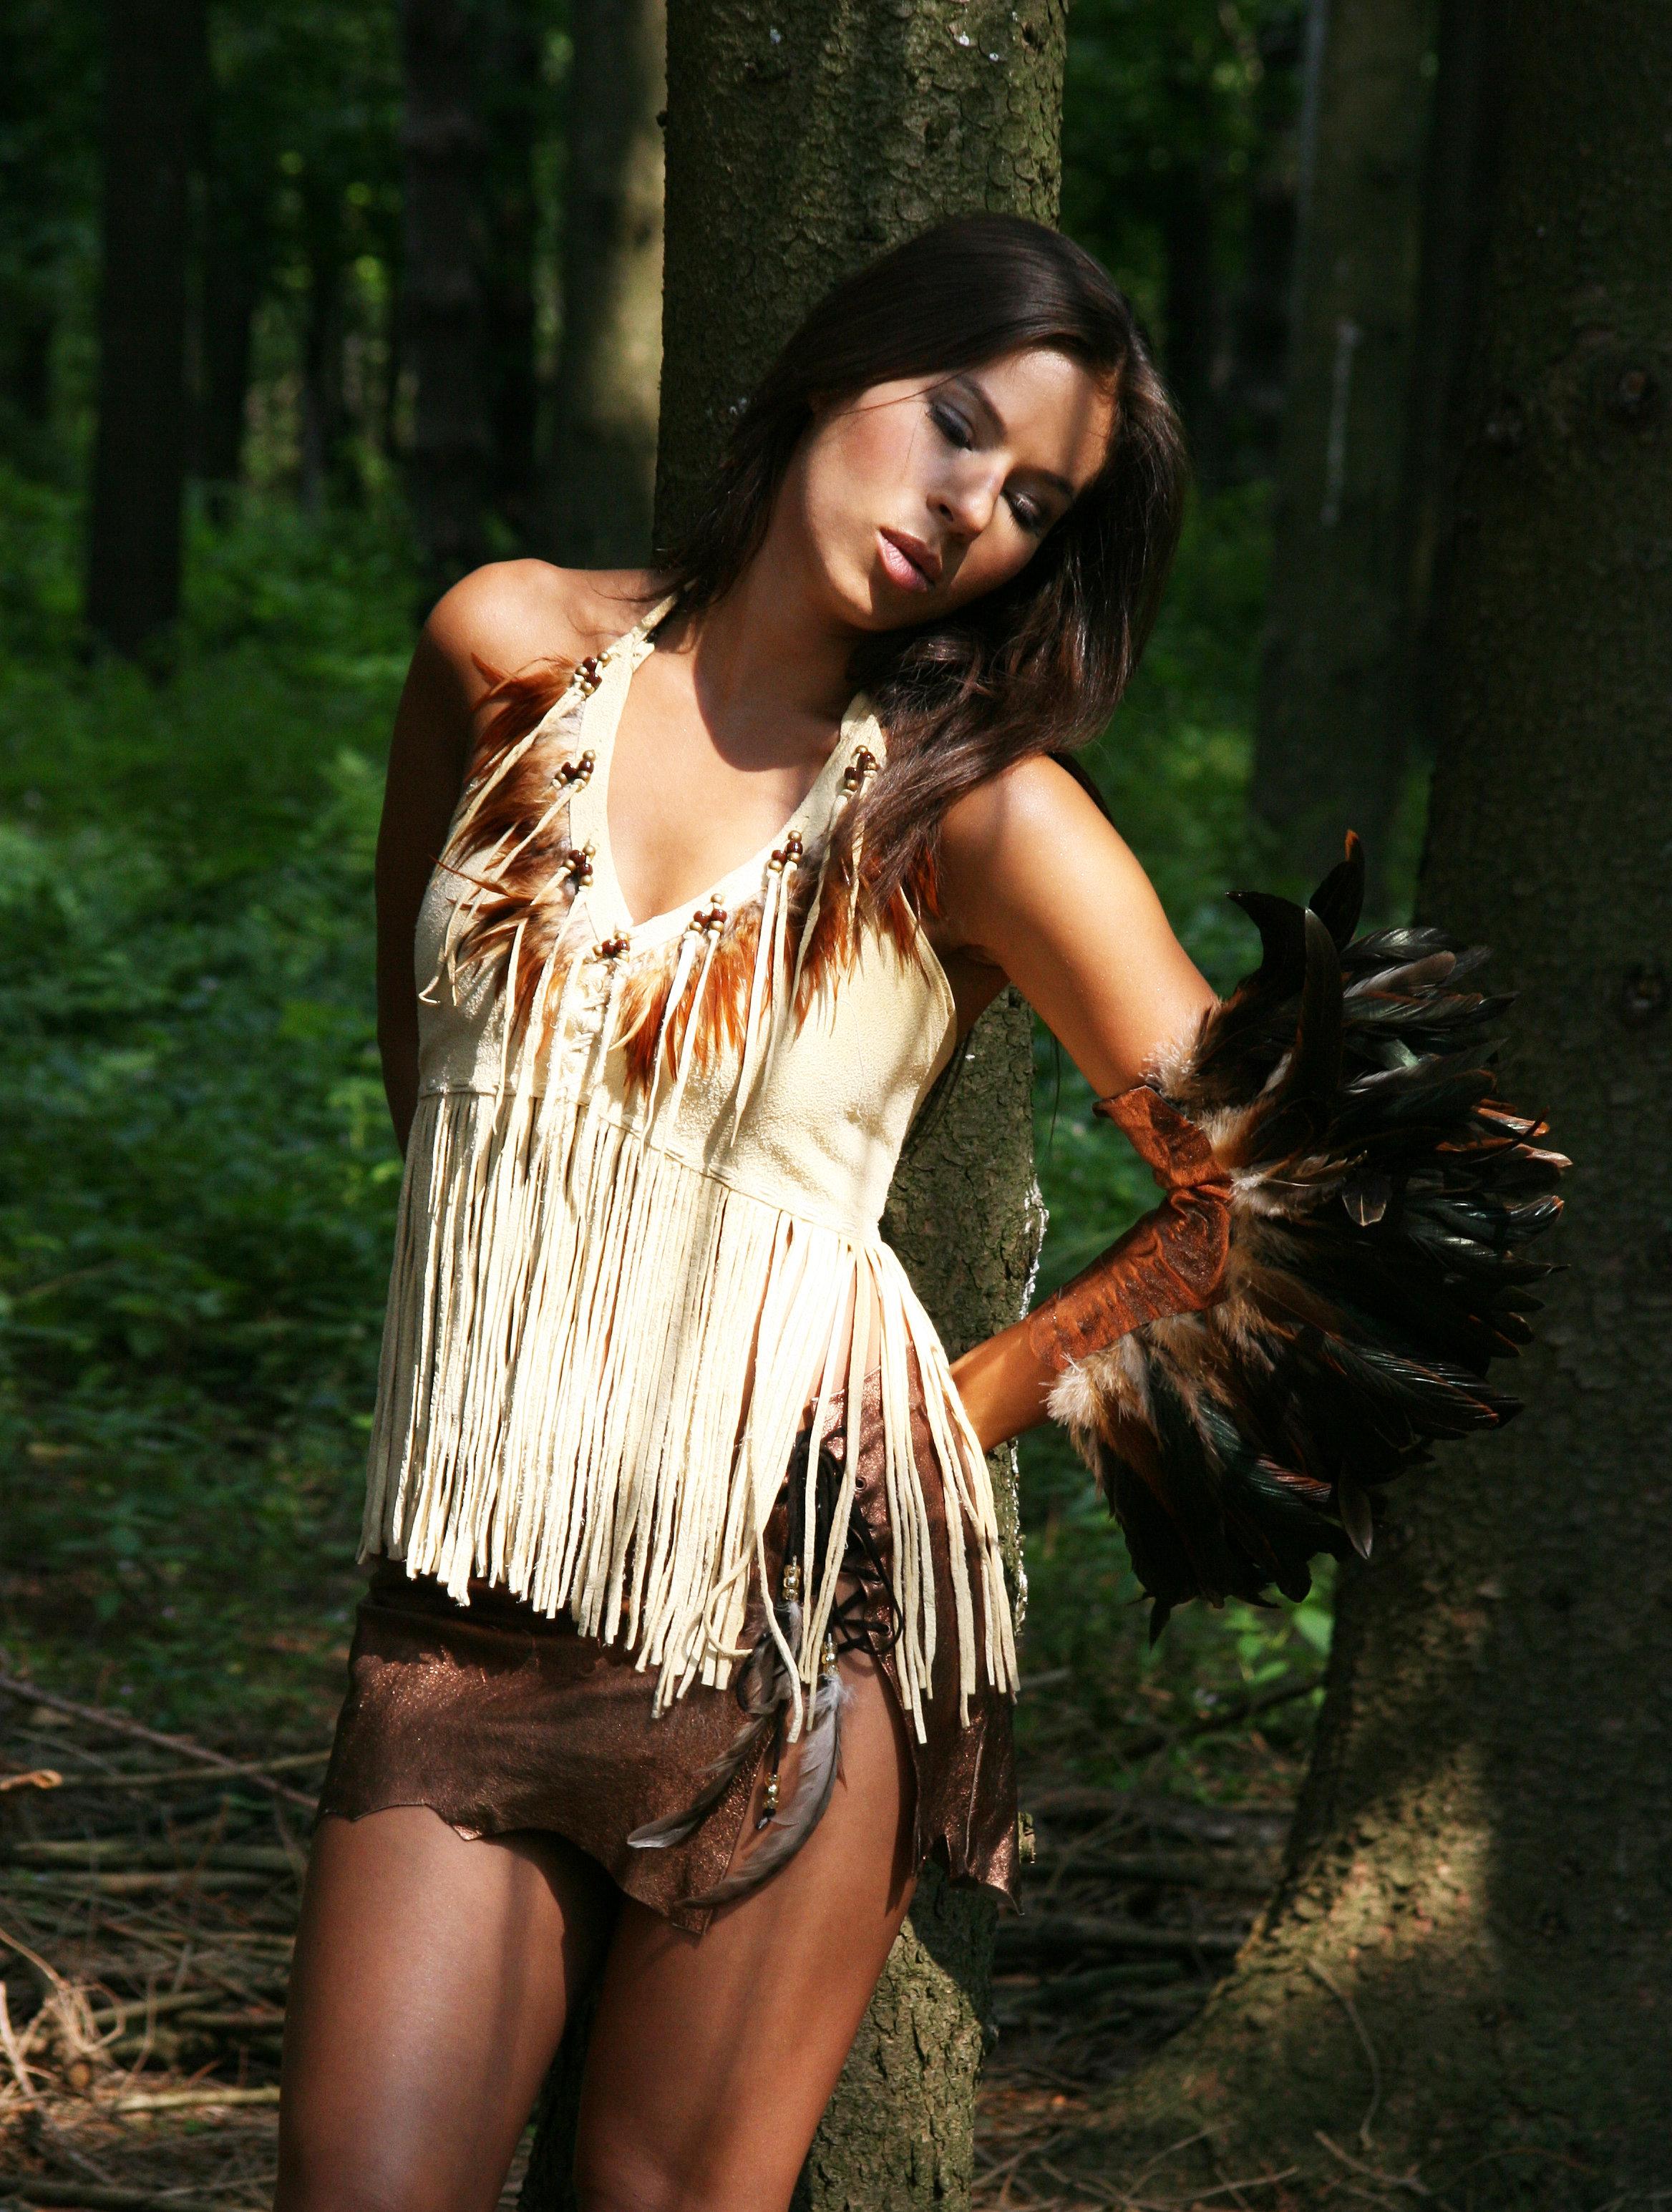 hot indian woman